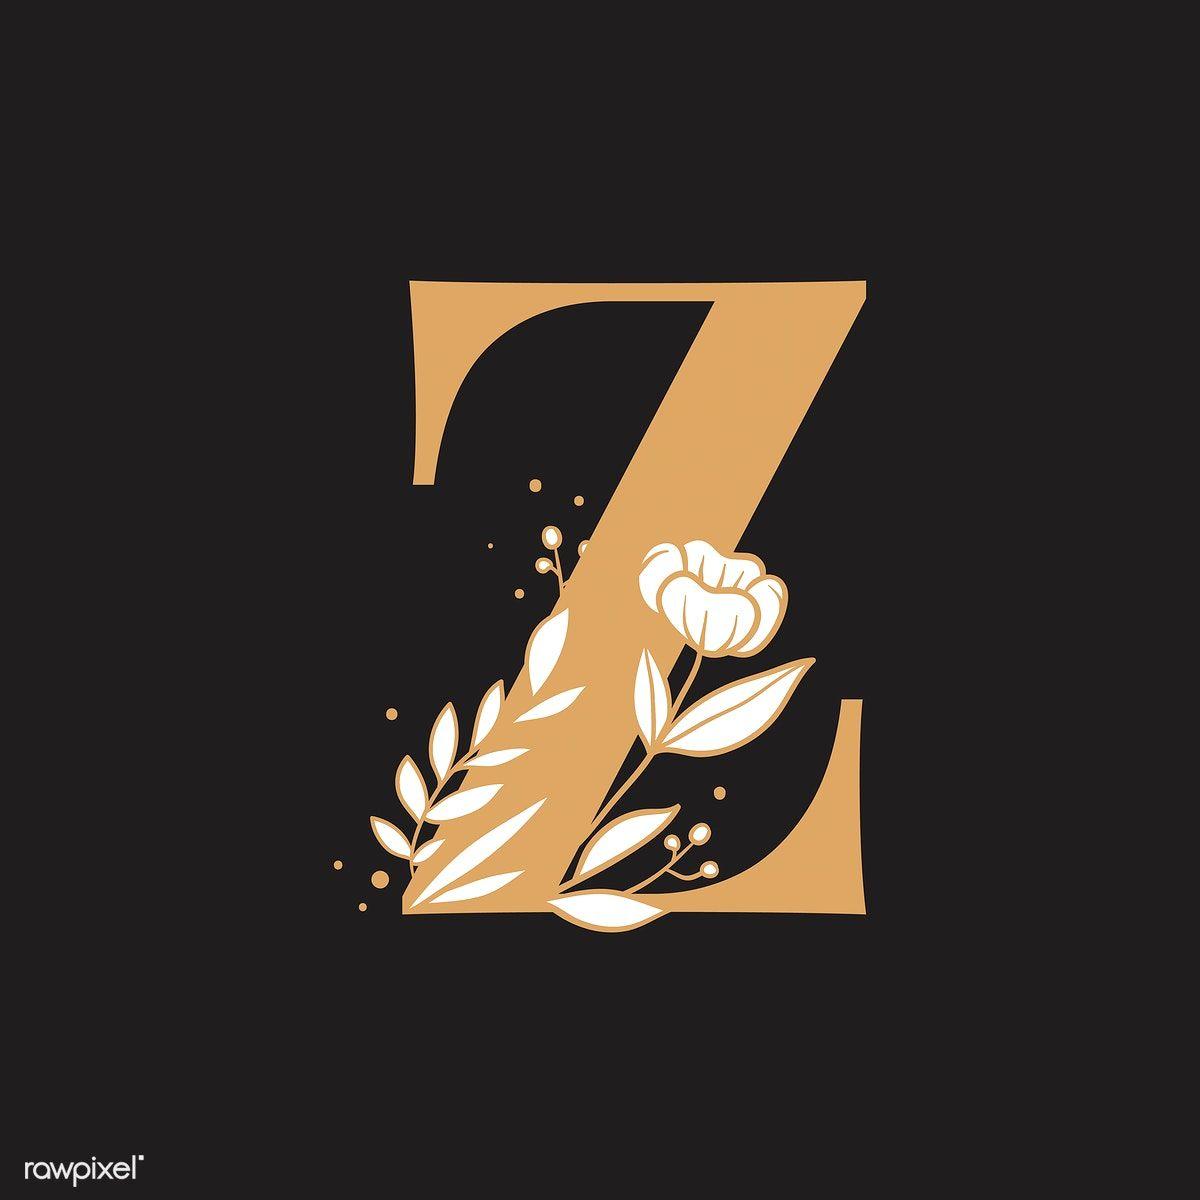 Botanical Capital Letter Z Vector Free Image By Rawpixel Com Tvzsu Vector Free Letter Z Floral Font